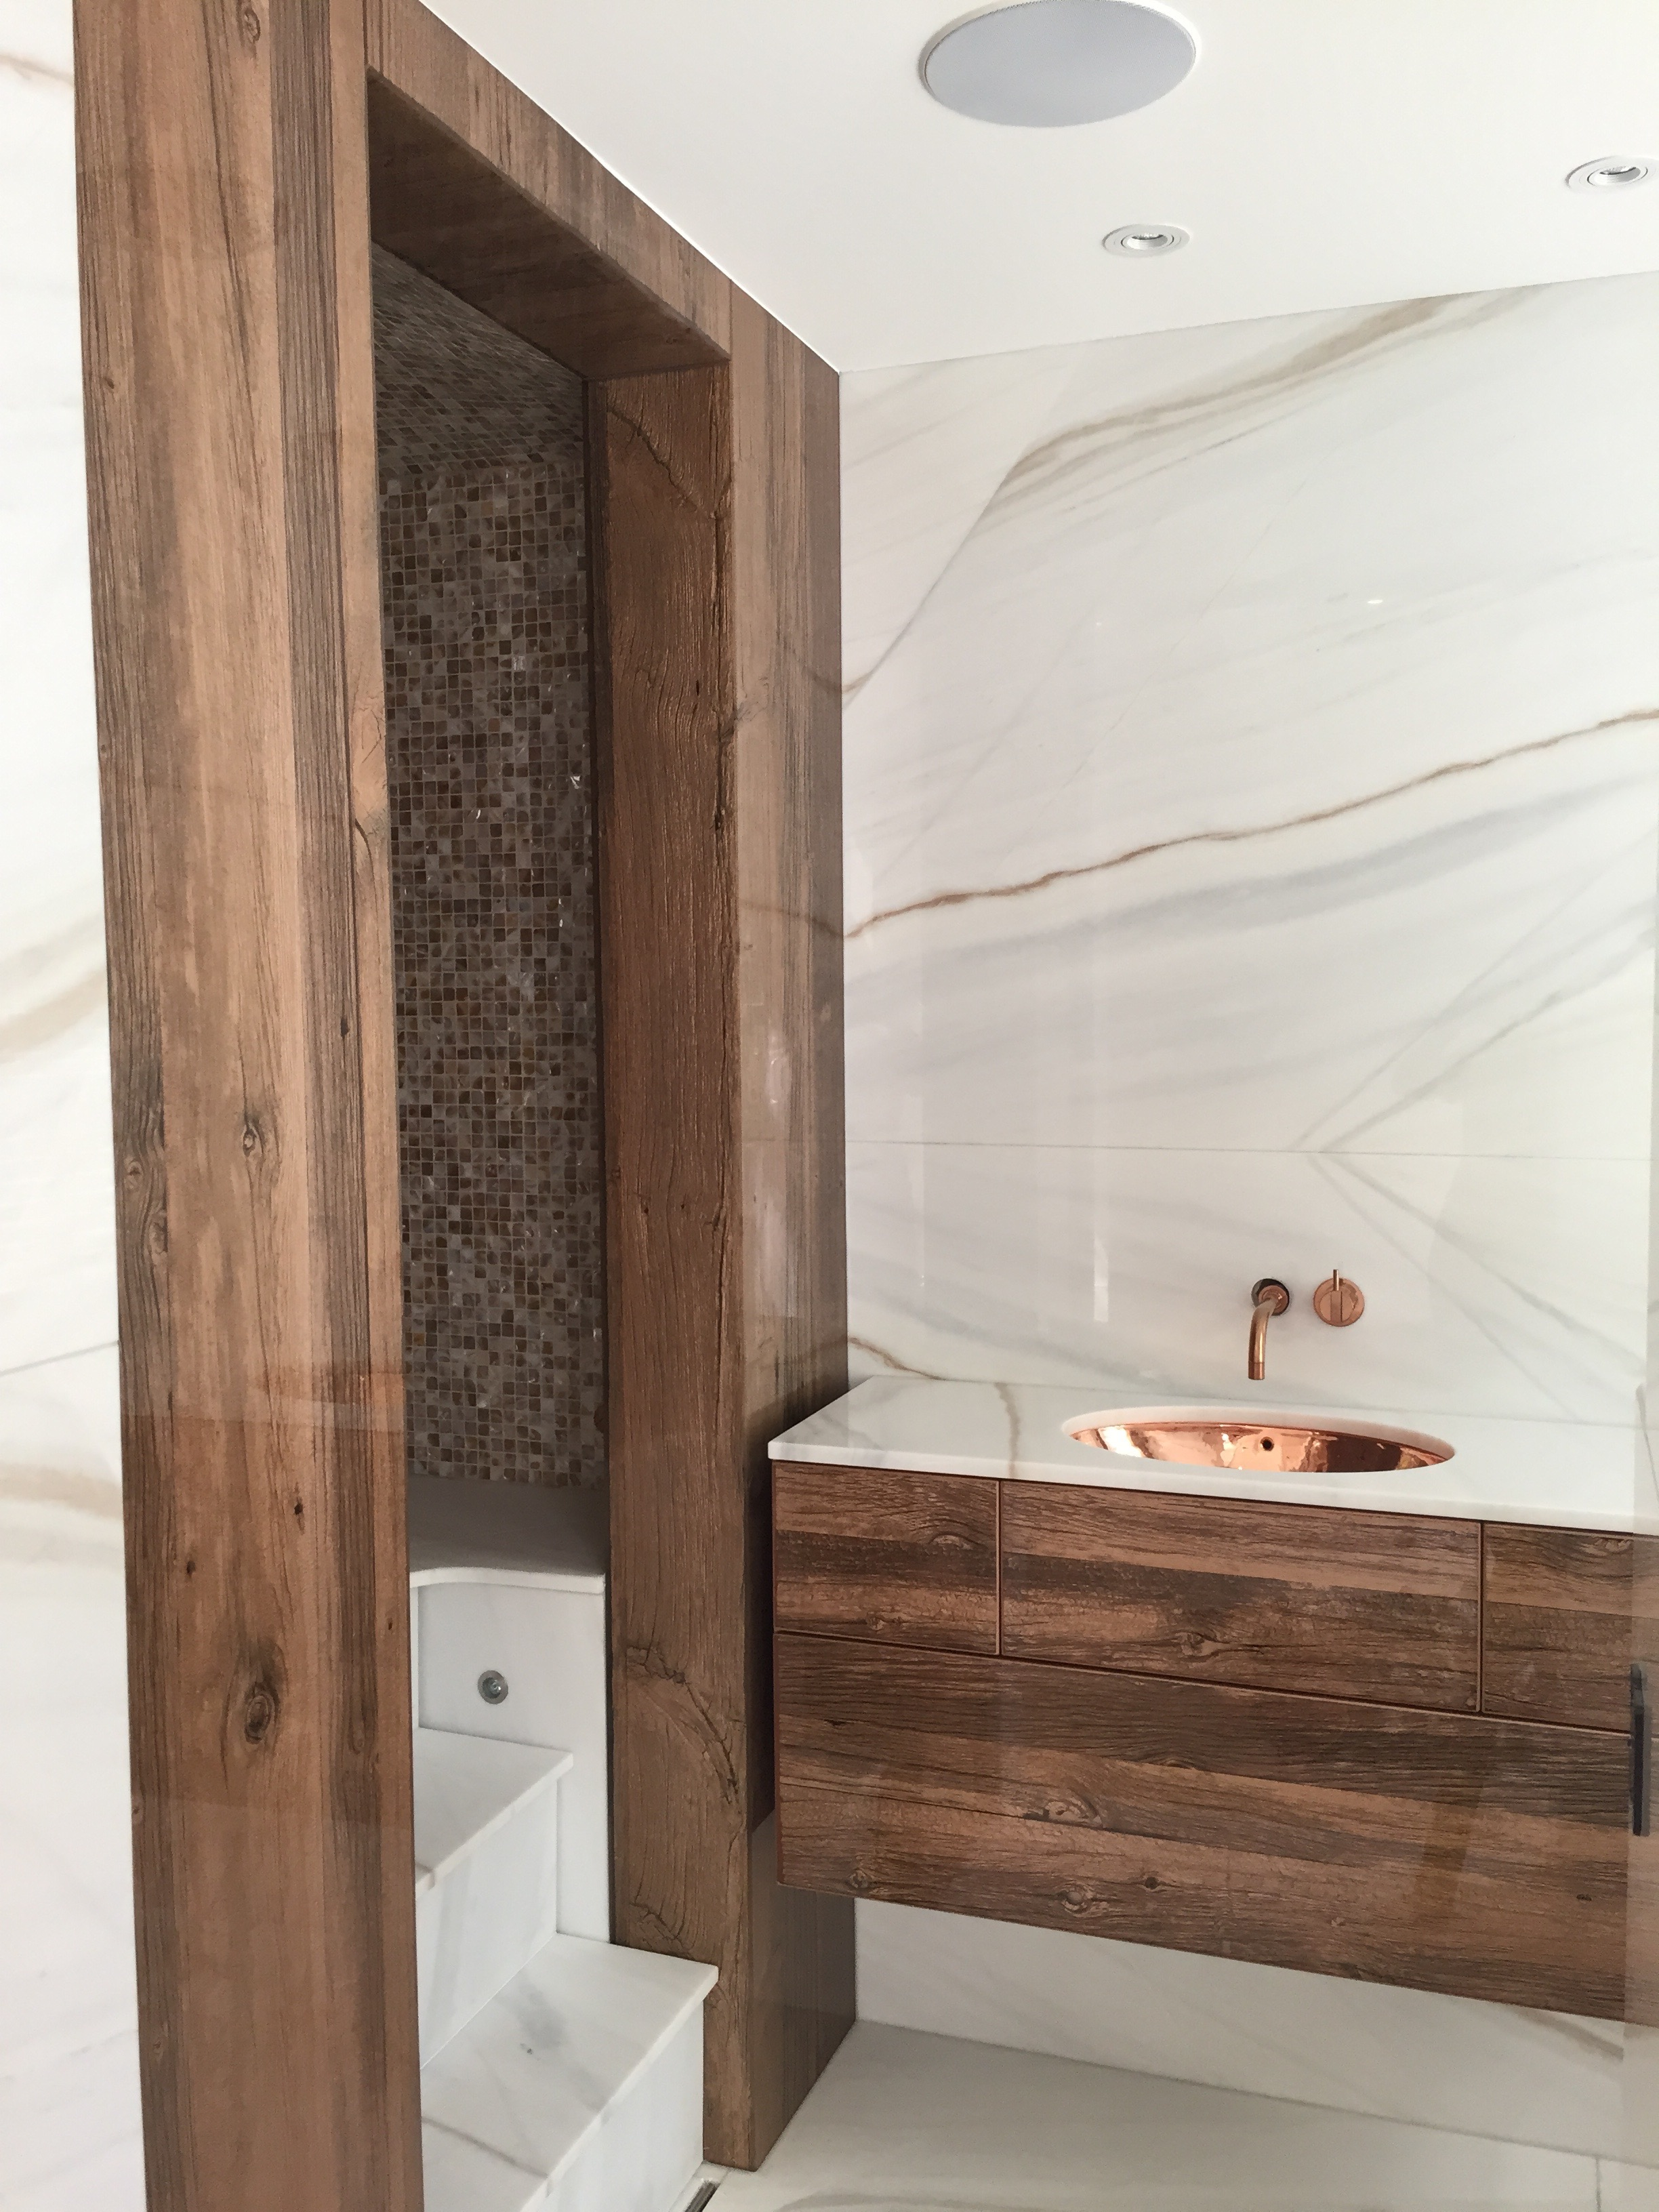 BITC bathroom Iced palomino Amsterdam .jpeg